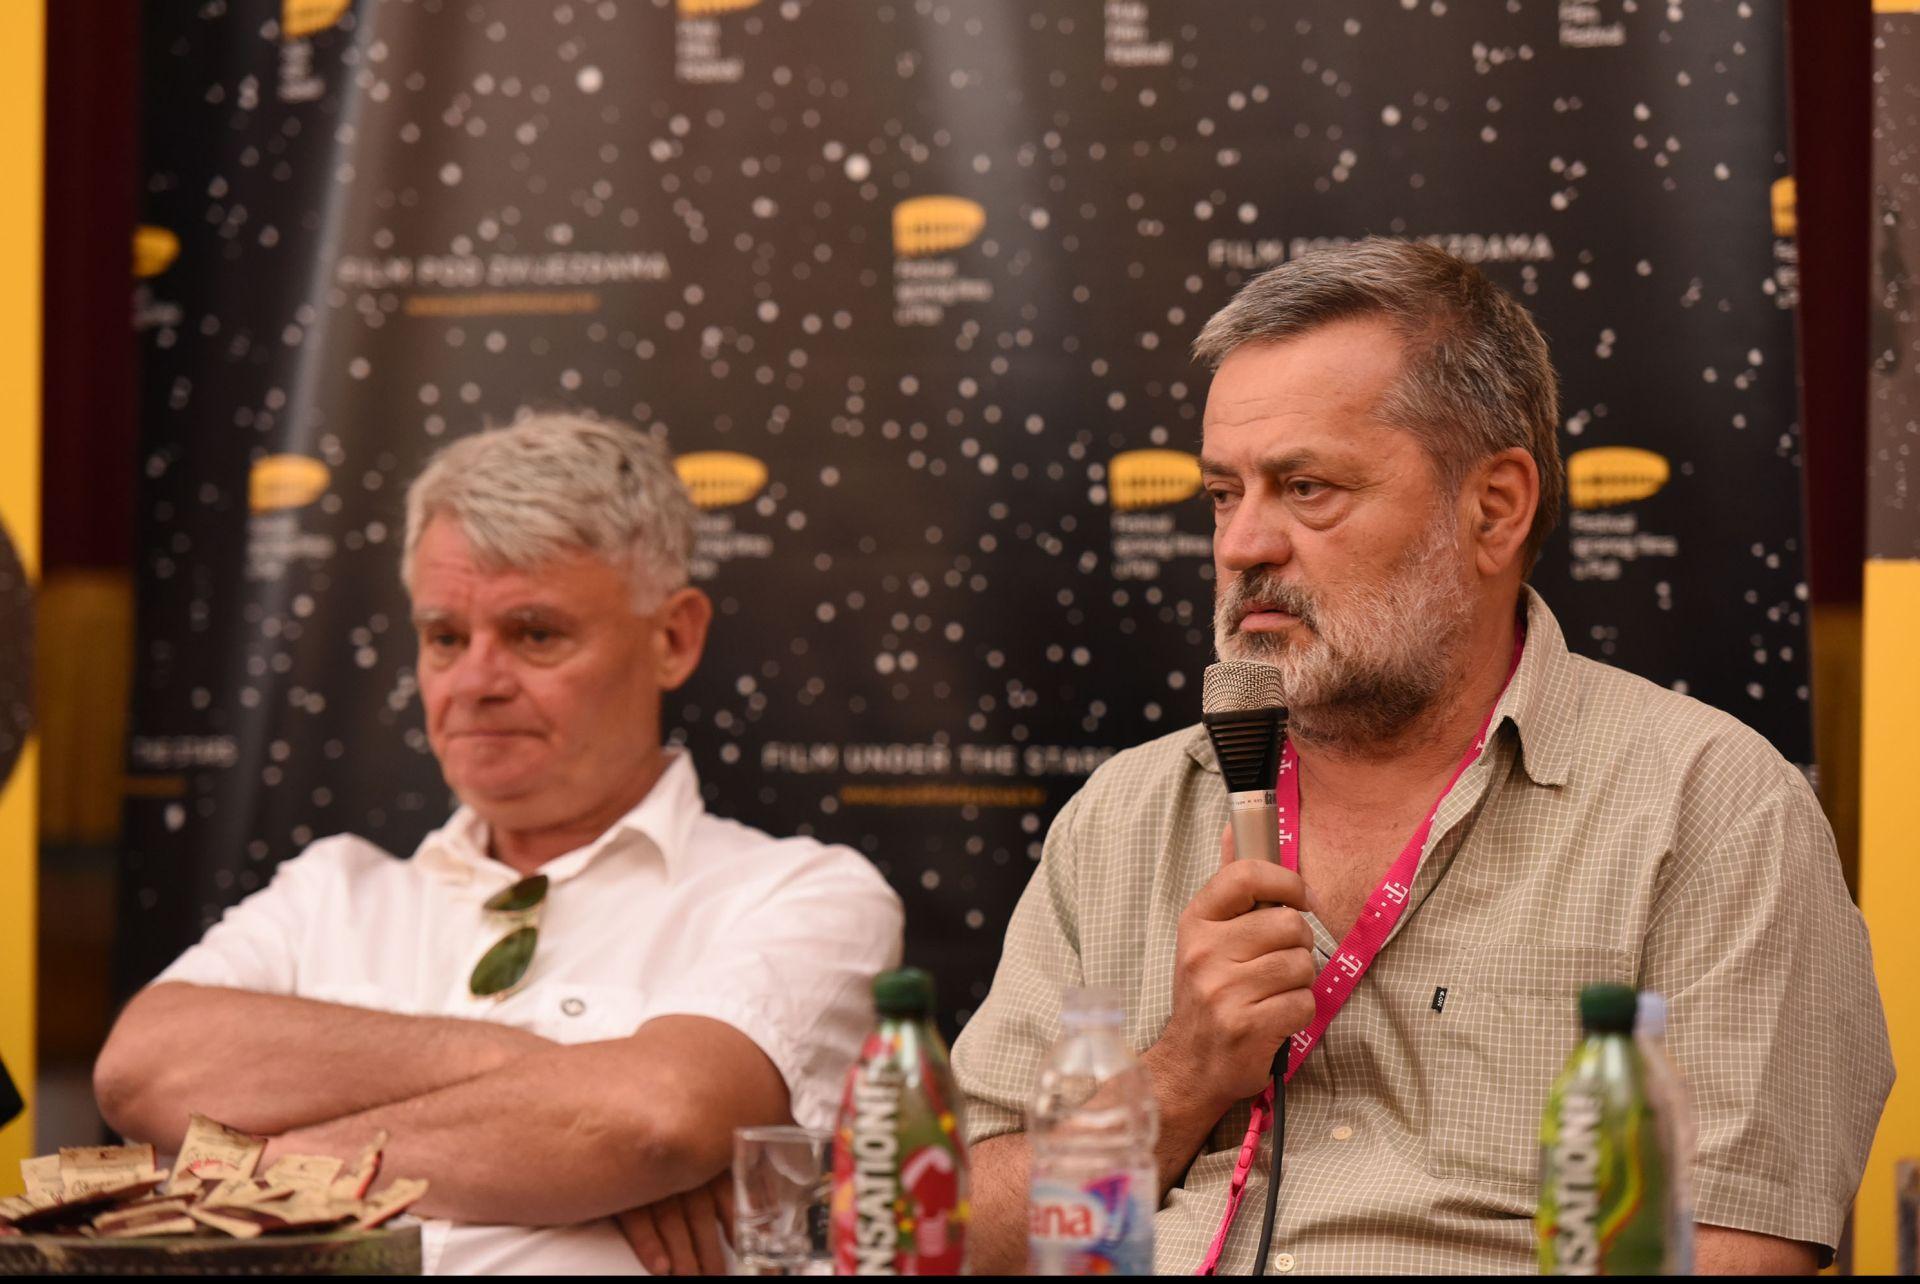 Branko Schmidt očekuje pozitivne reakcije pulske publike